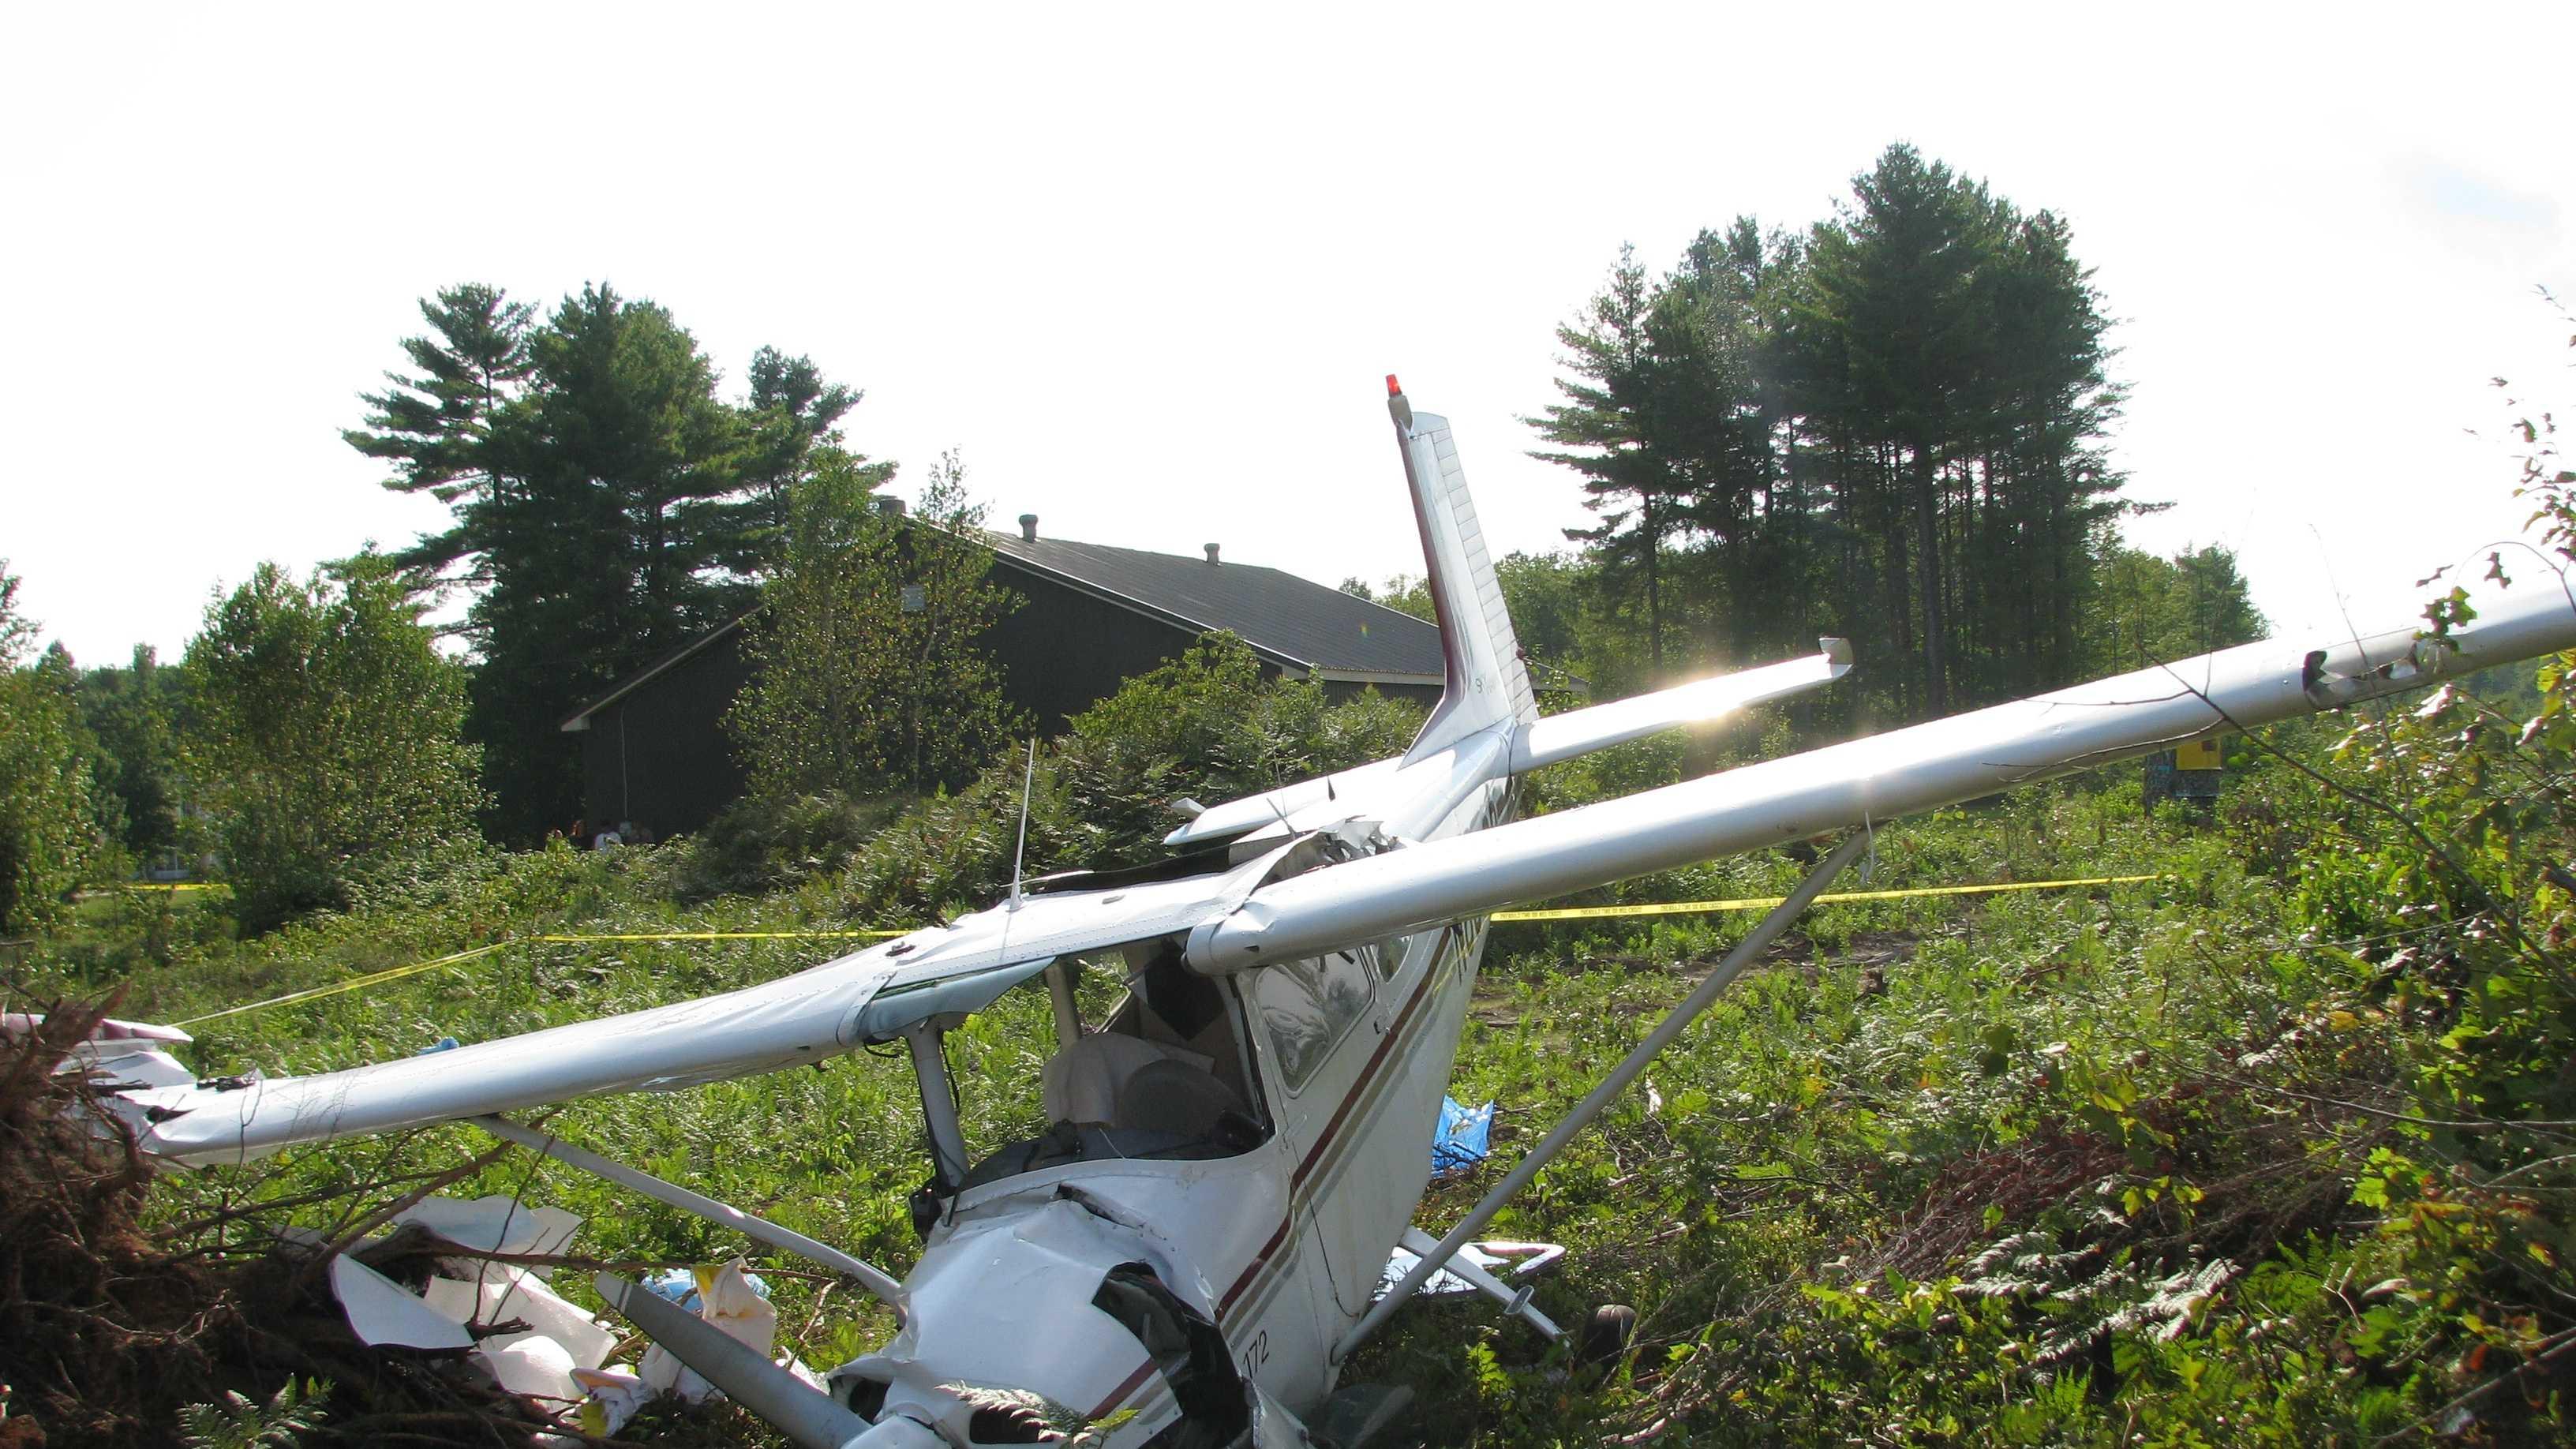 Limington plane crash